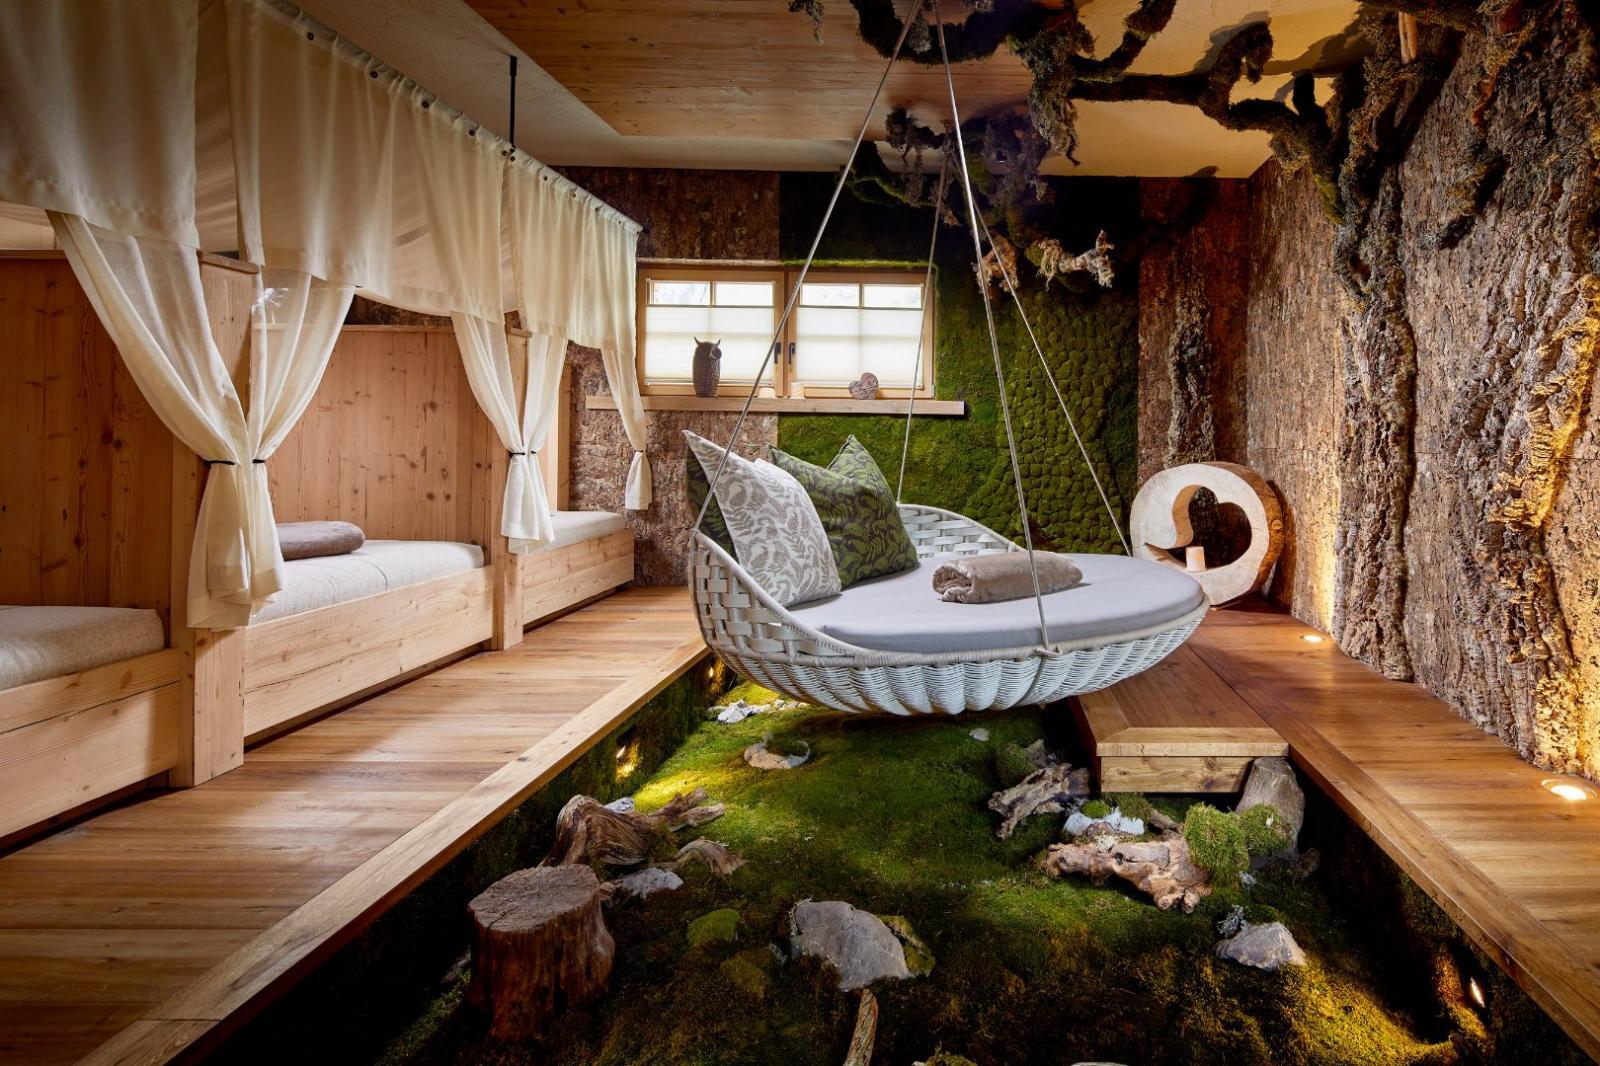 SPA: Foto vom Wellnesshotel Gramai Alm alpengenuss & natur spa | Wellness Tirol